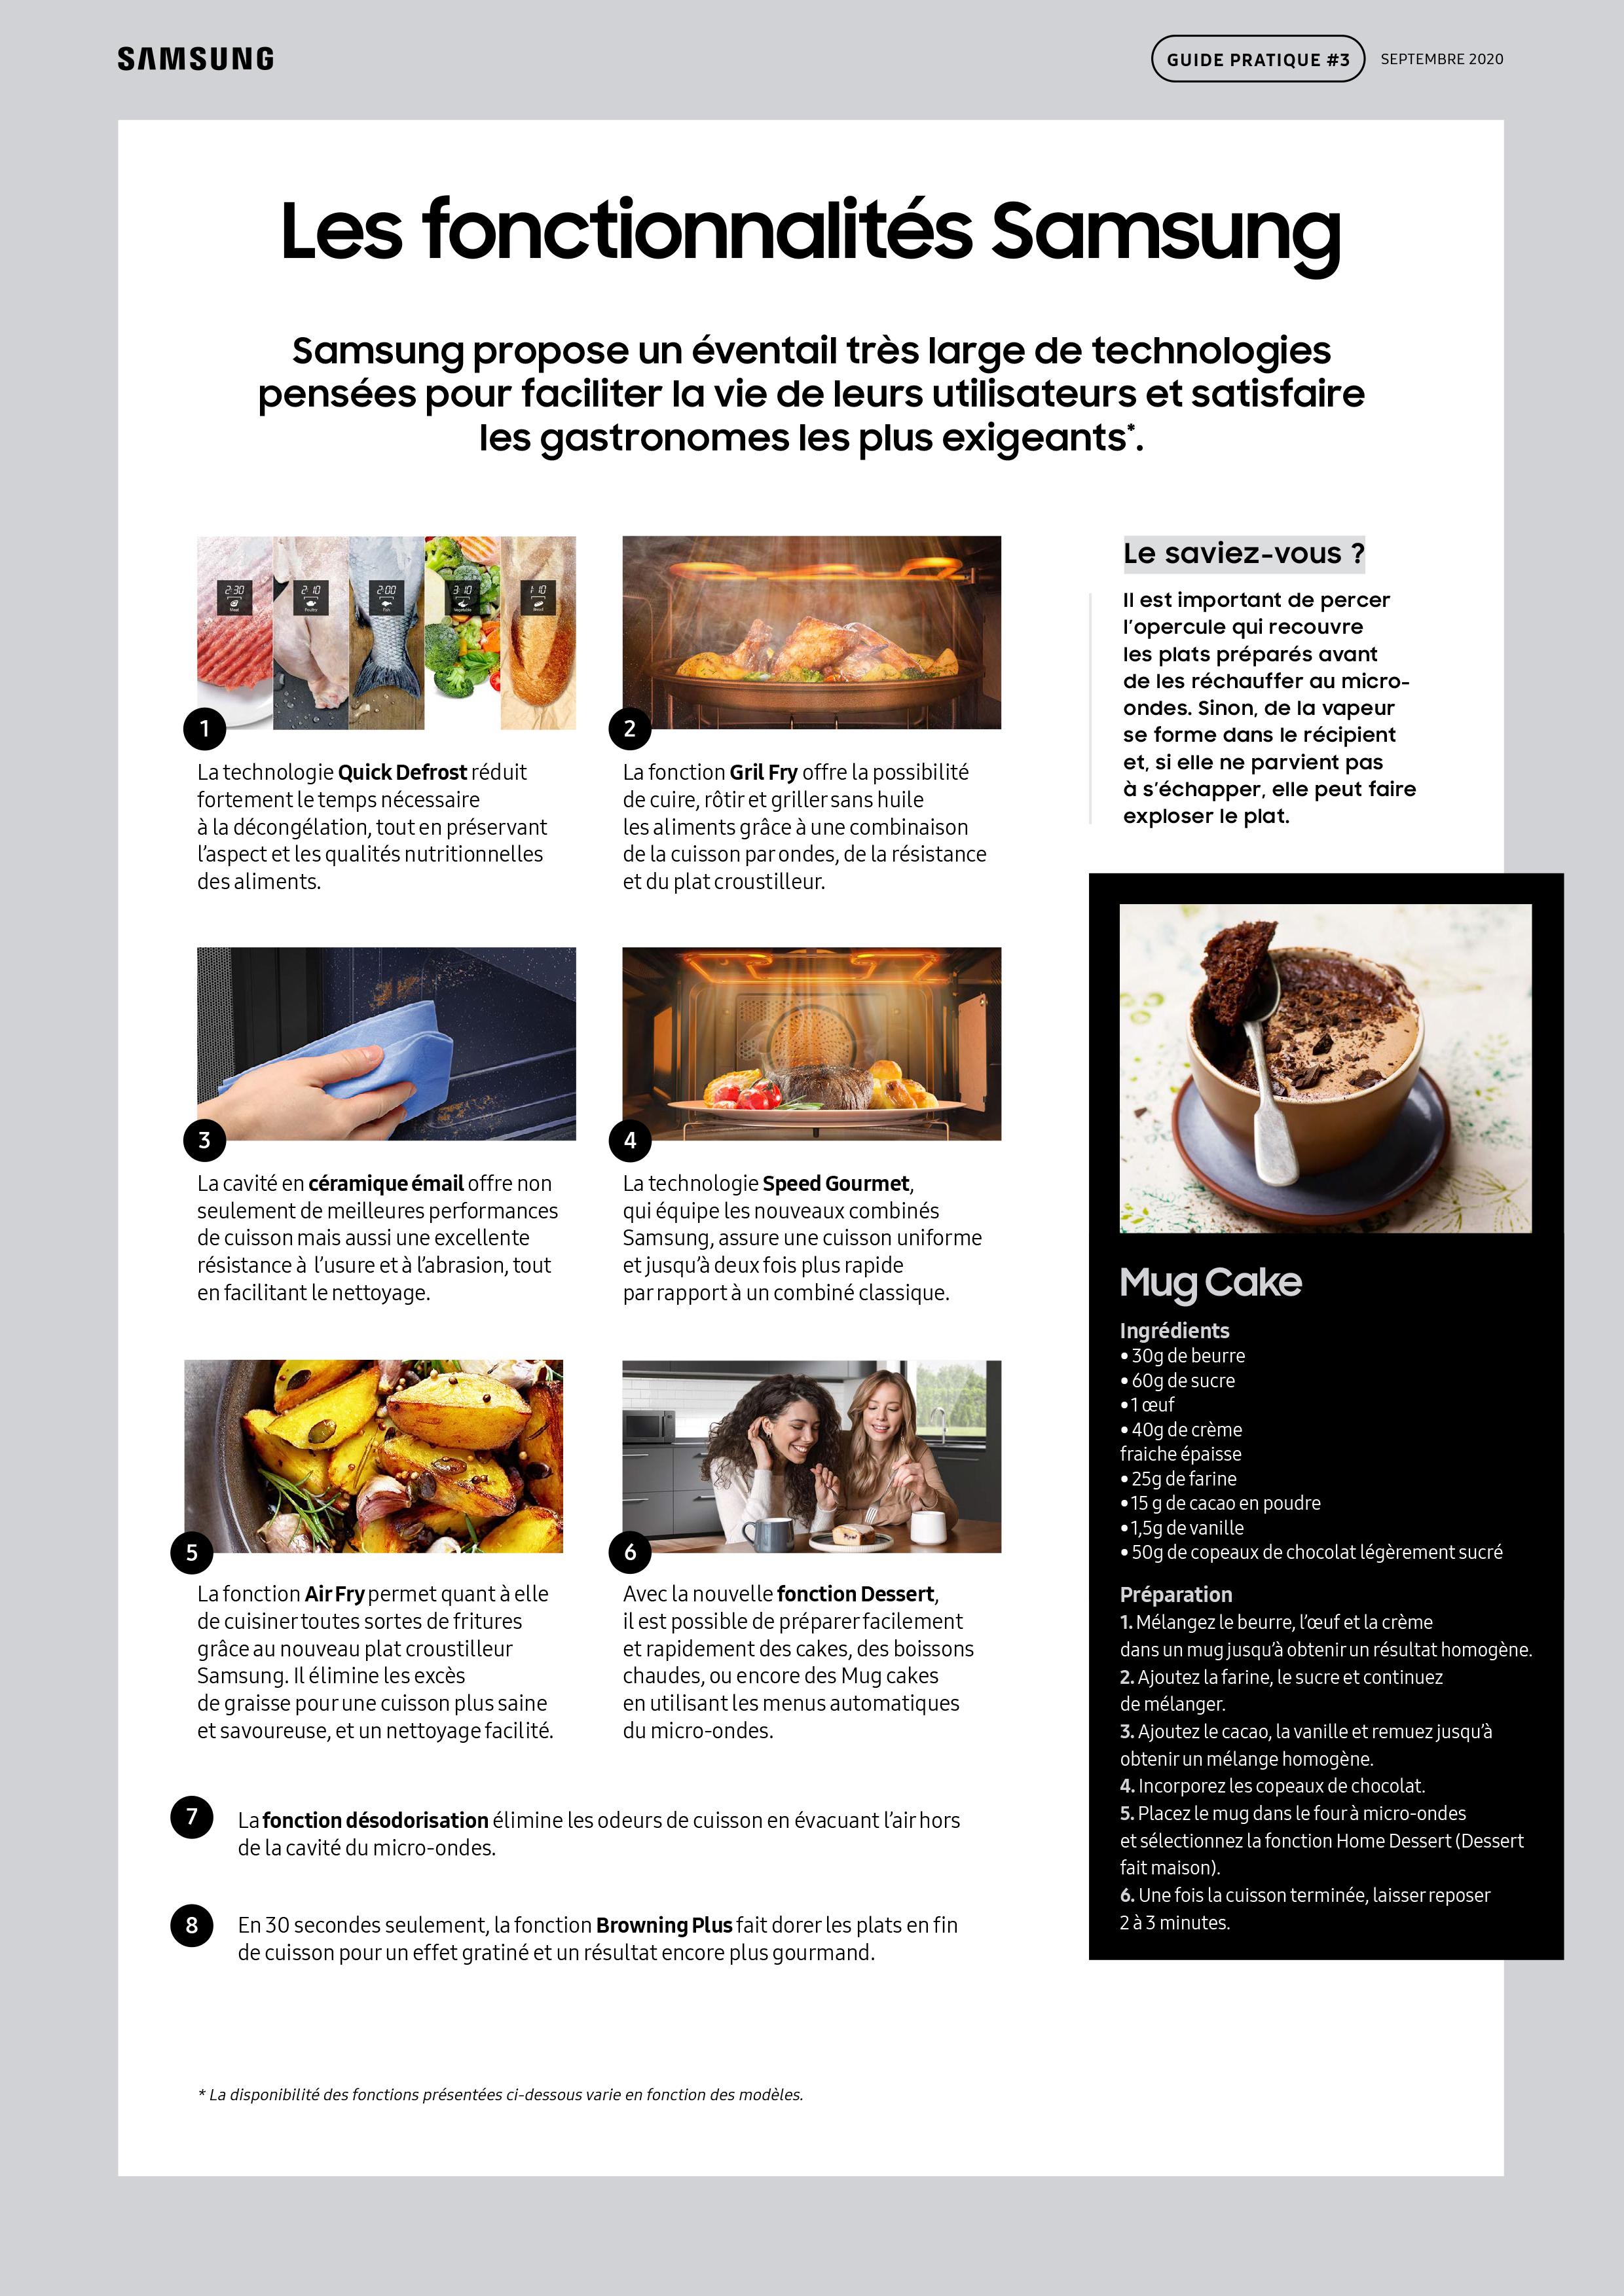 Guide pratique Samsung micro-ondes-5